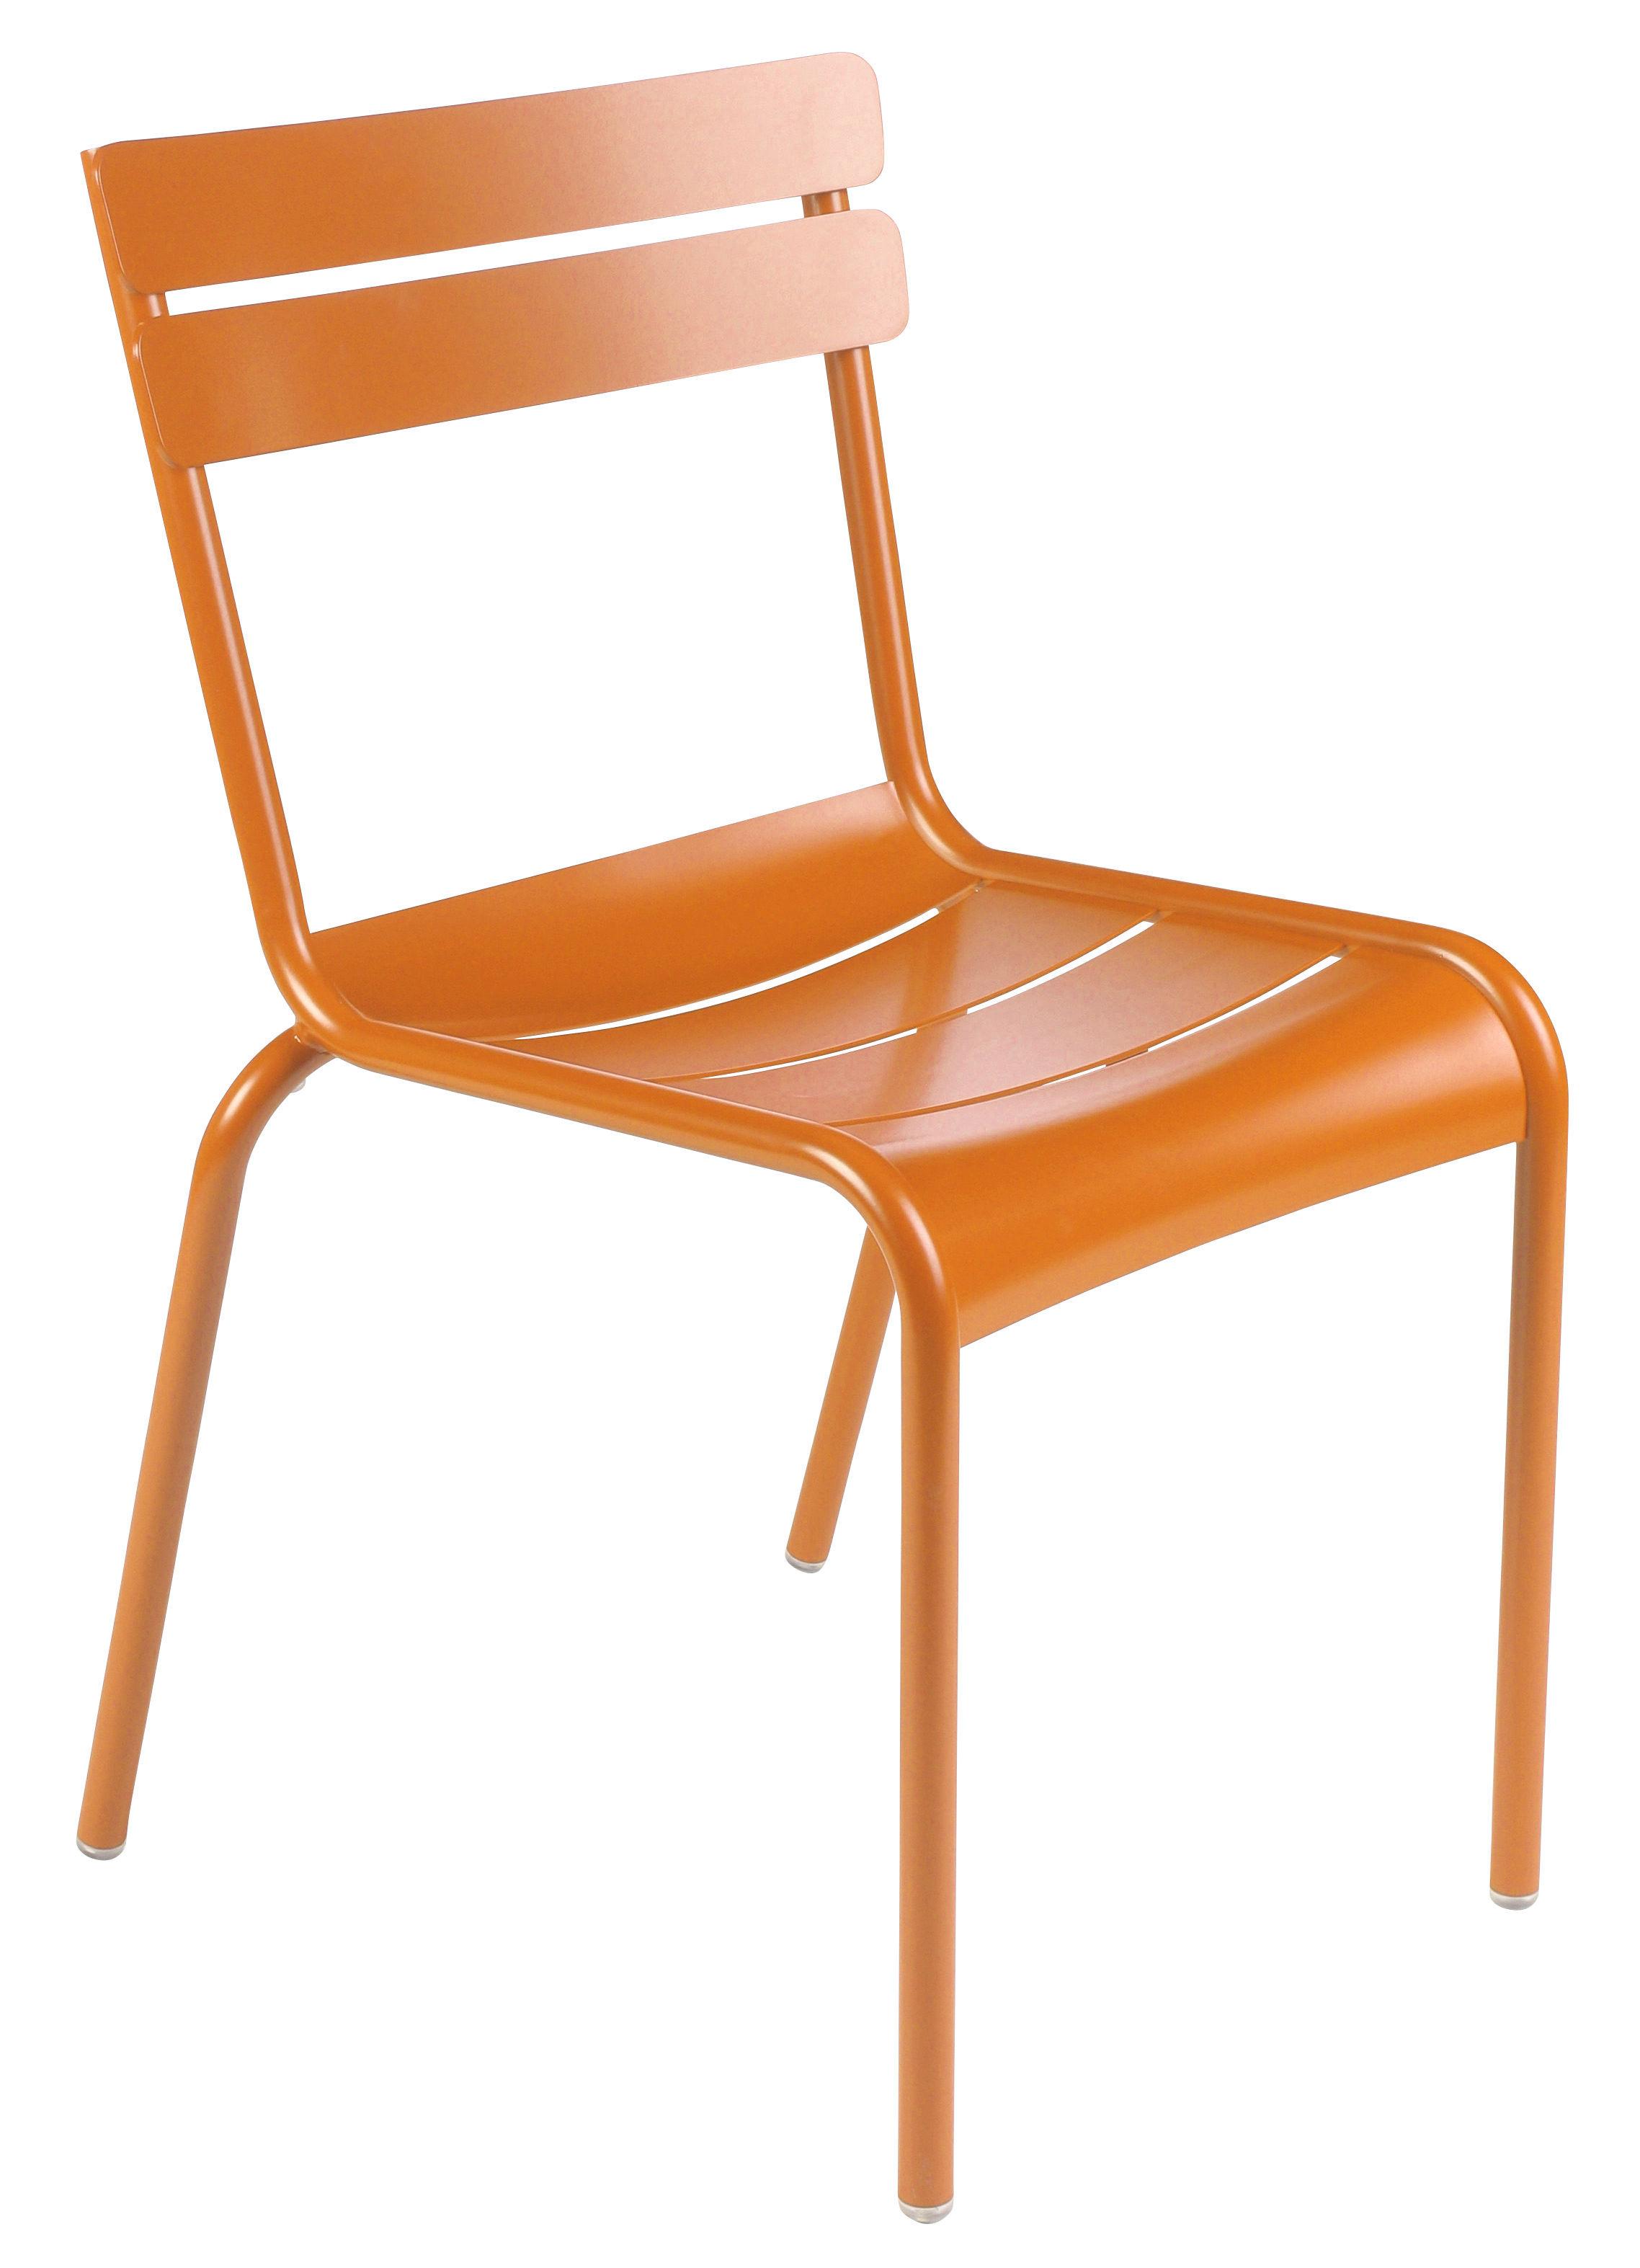 chaise enfant luxembourg kid aluminium carotte fermob. Black Bedroom Furniture Sets. Home Design Ideas